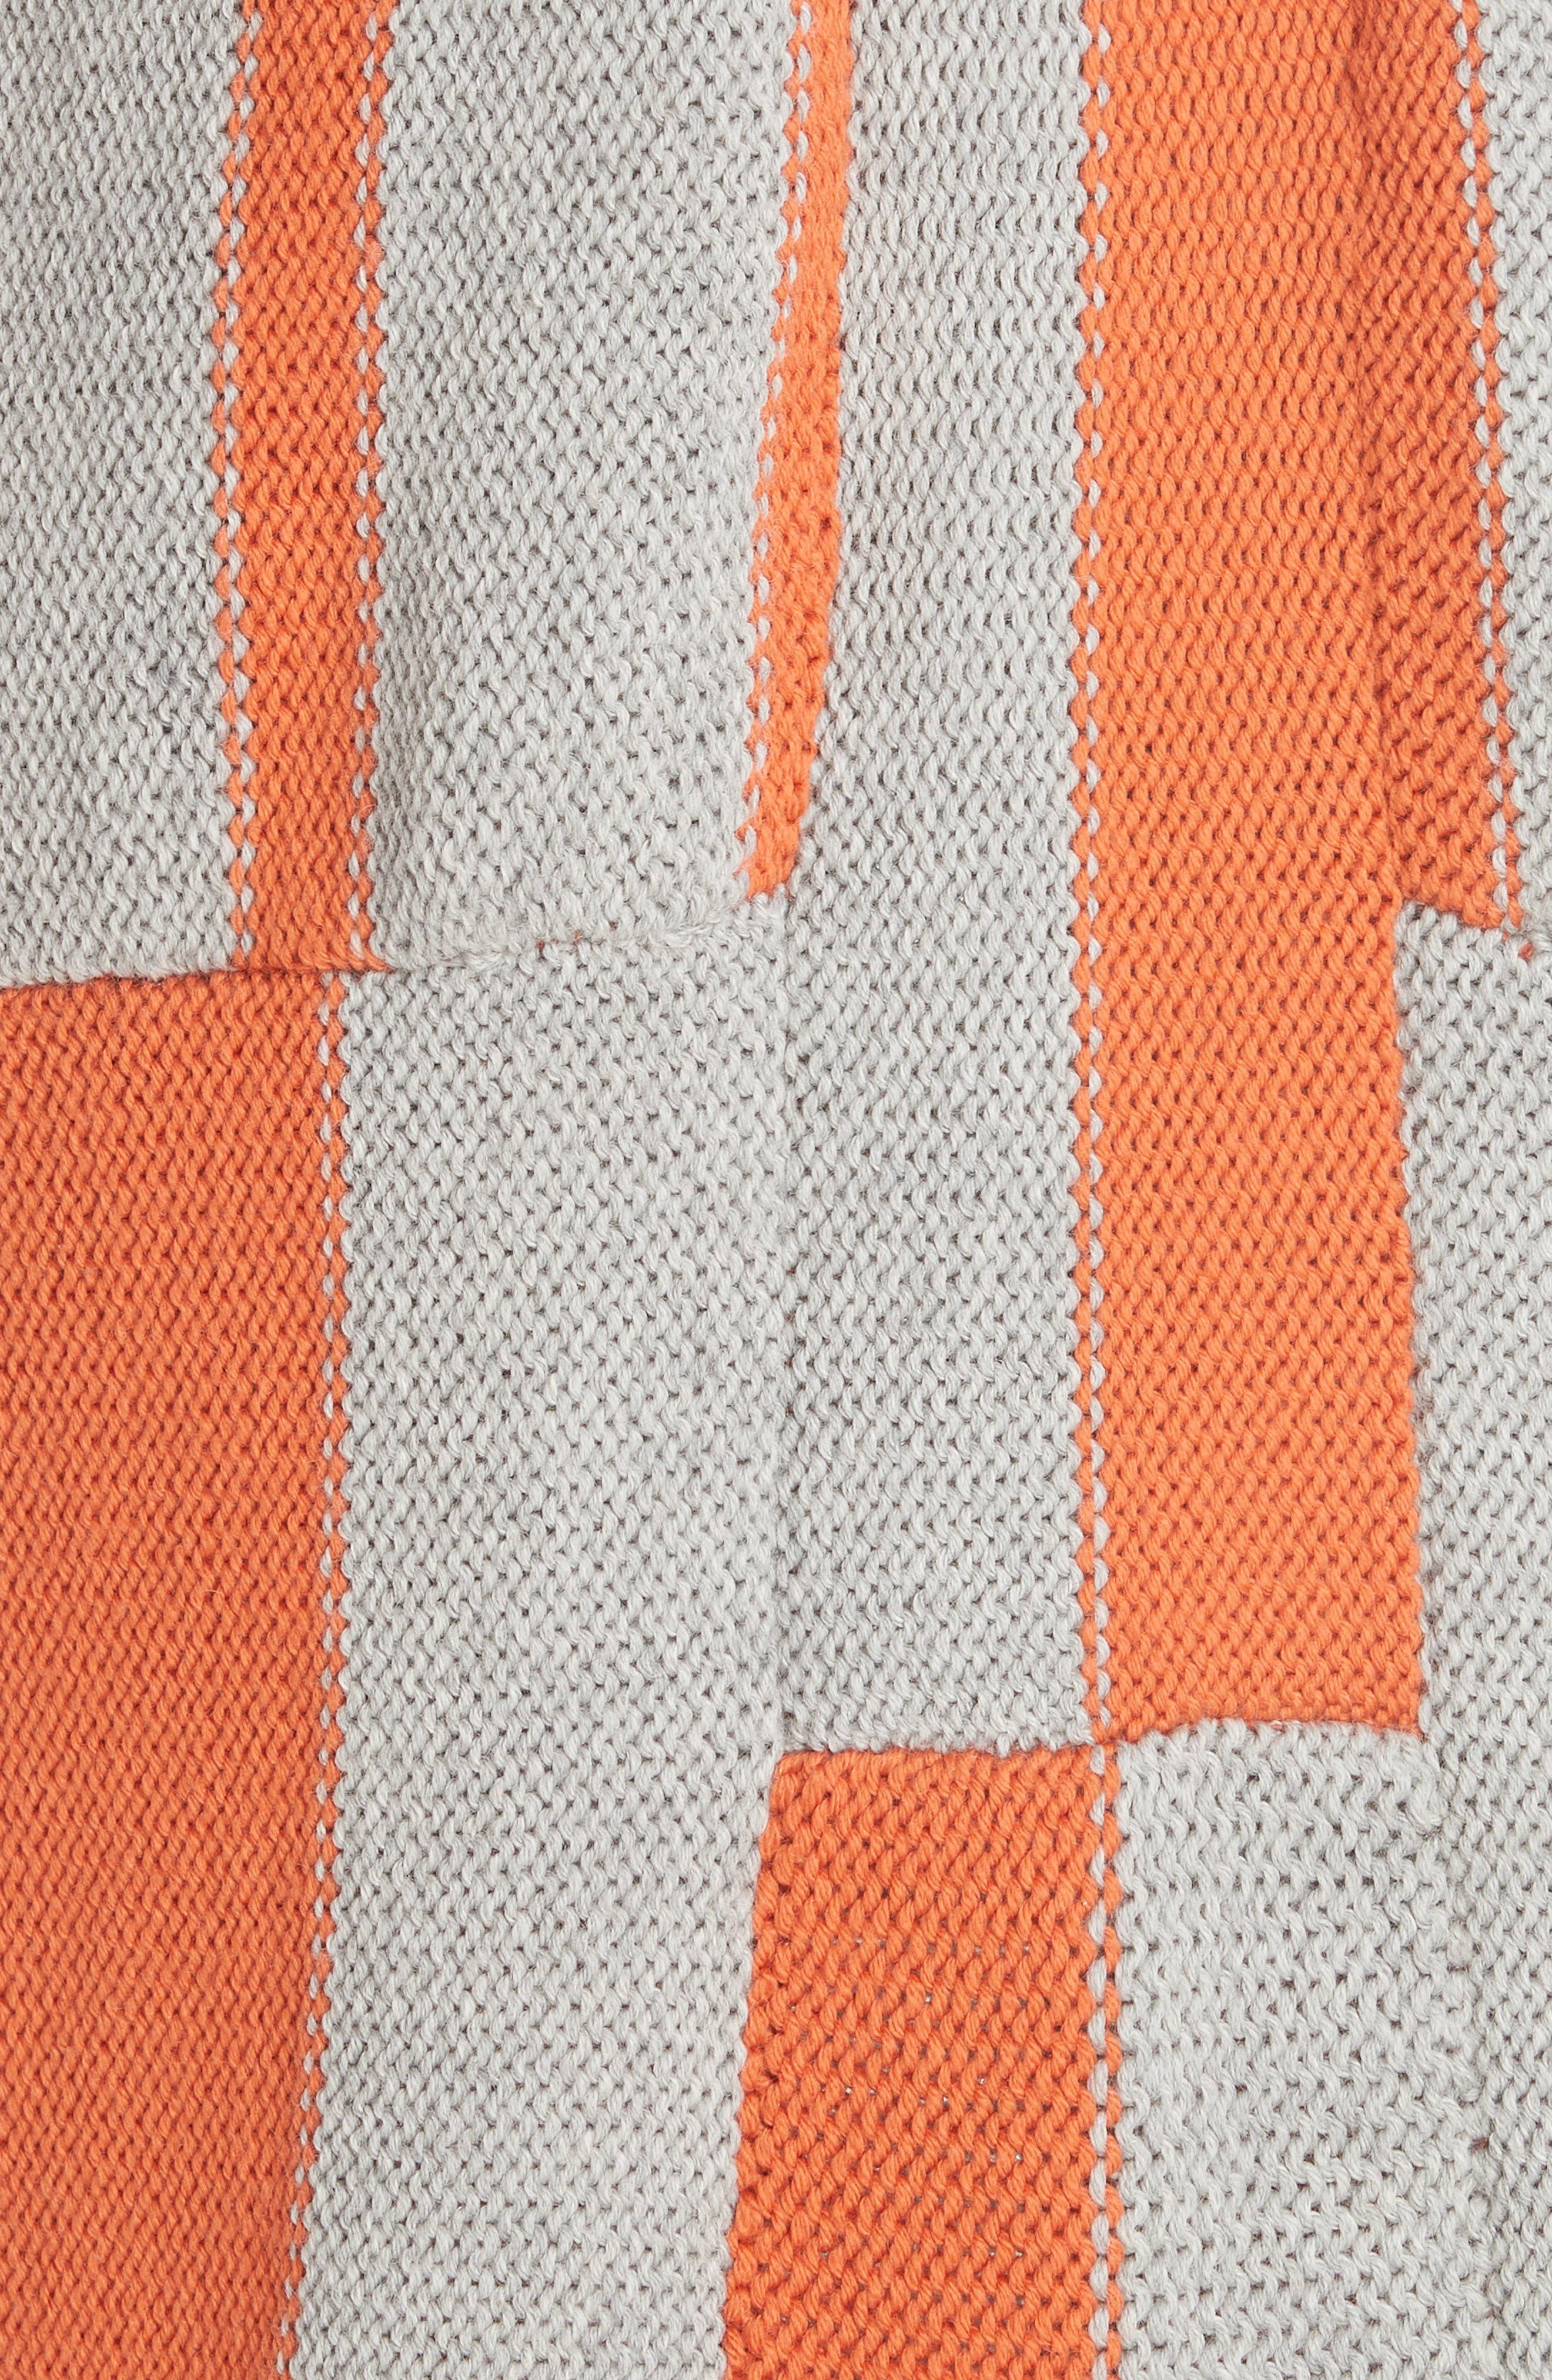 Stripe Tassel Hem Sweater Dress,                             Alternate thumbnail 6, color,                             GROG - GREY ORANGE